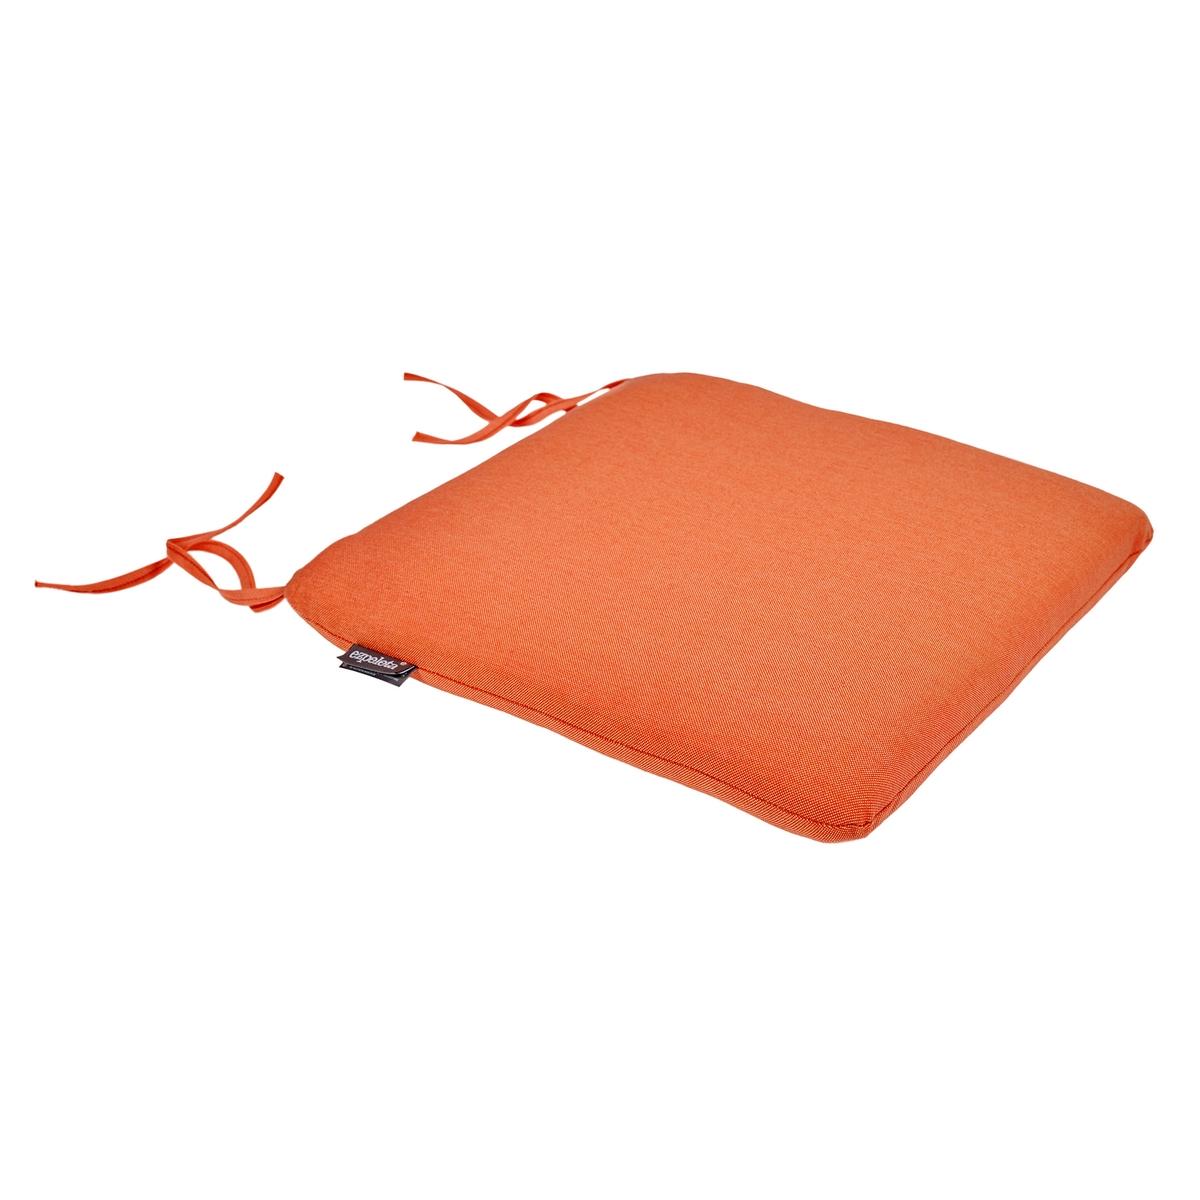 Подушка для стула квадратная съёмная SUNAE (комплект из 2 подушек) подушка для стульев комфорт 40 40